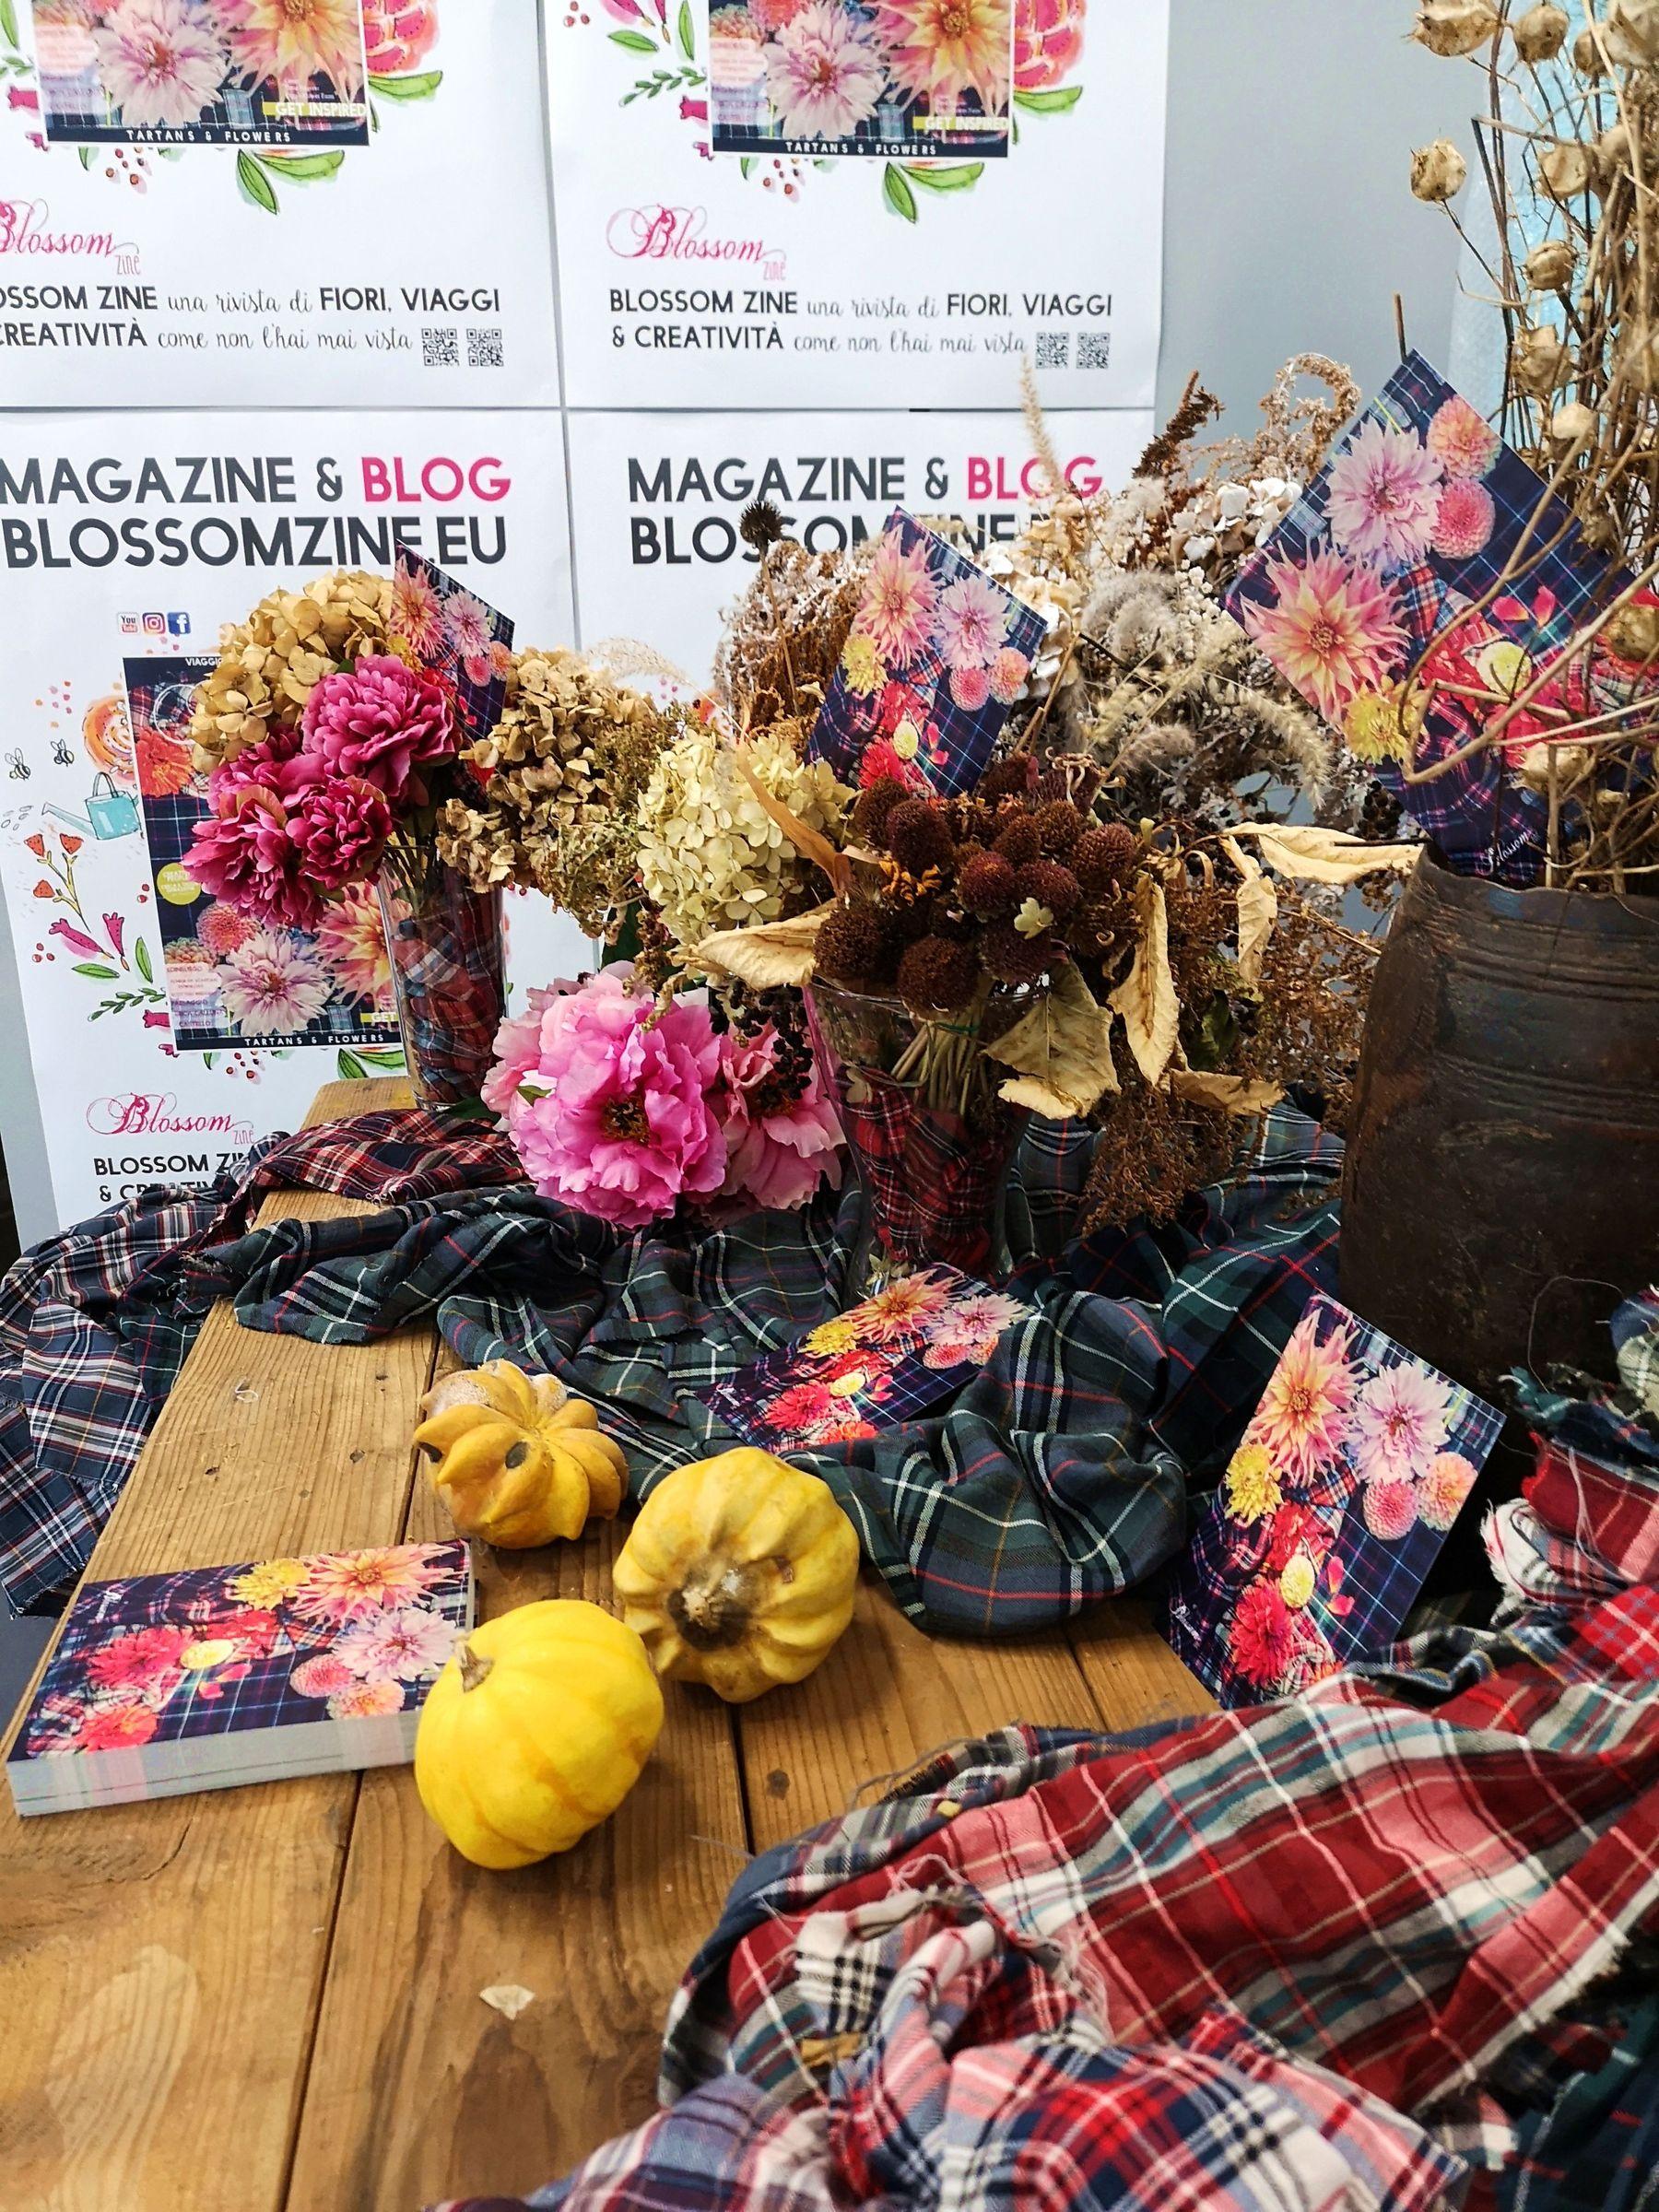 Blossom zine autumn numero scozia